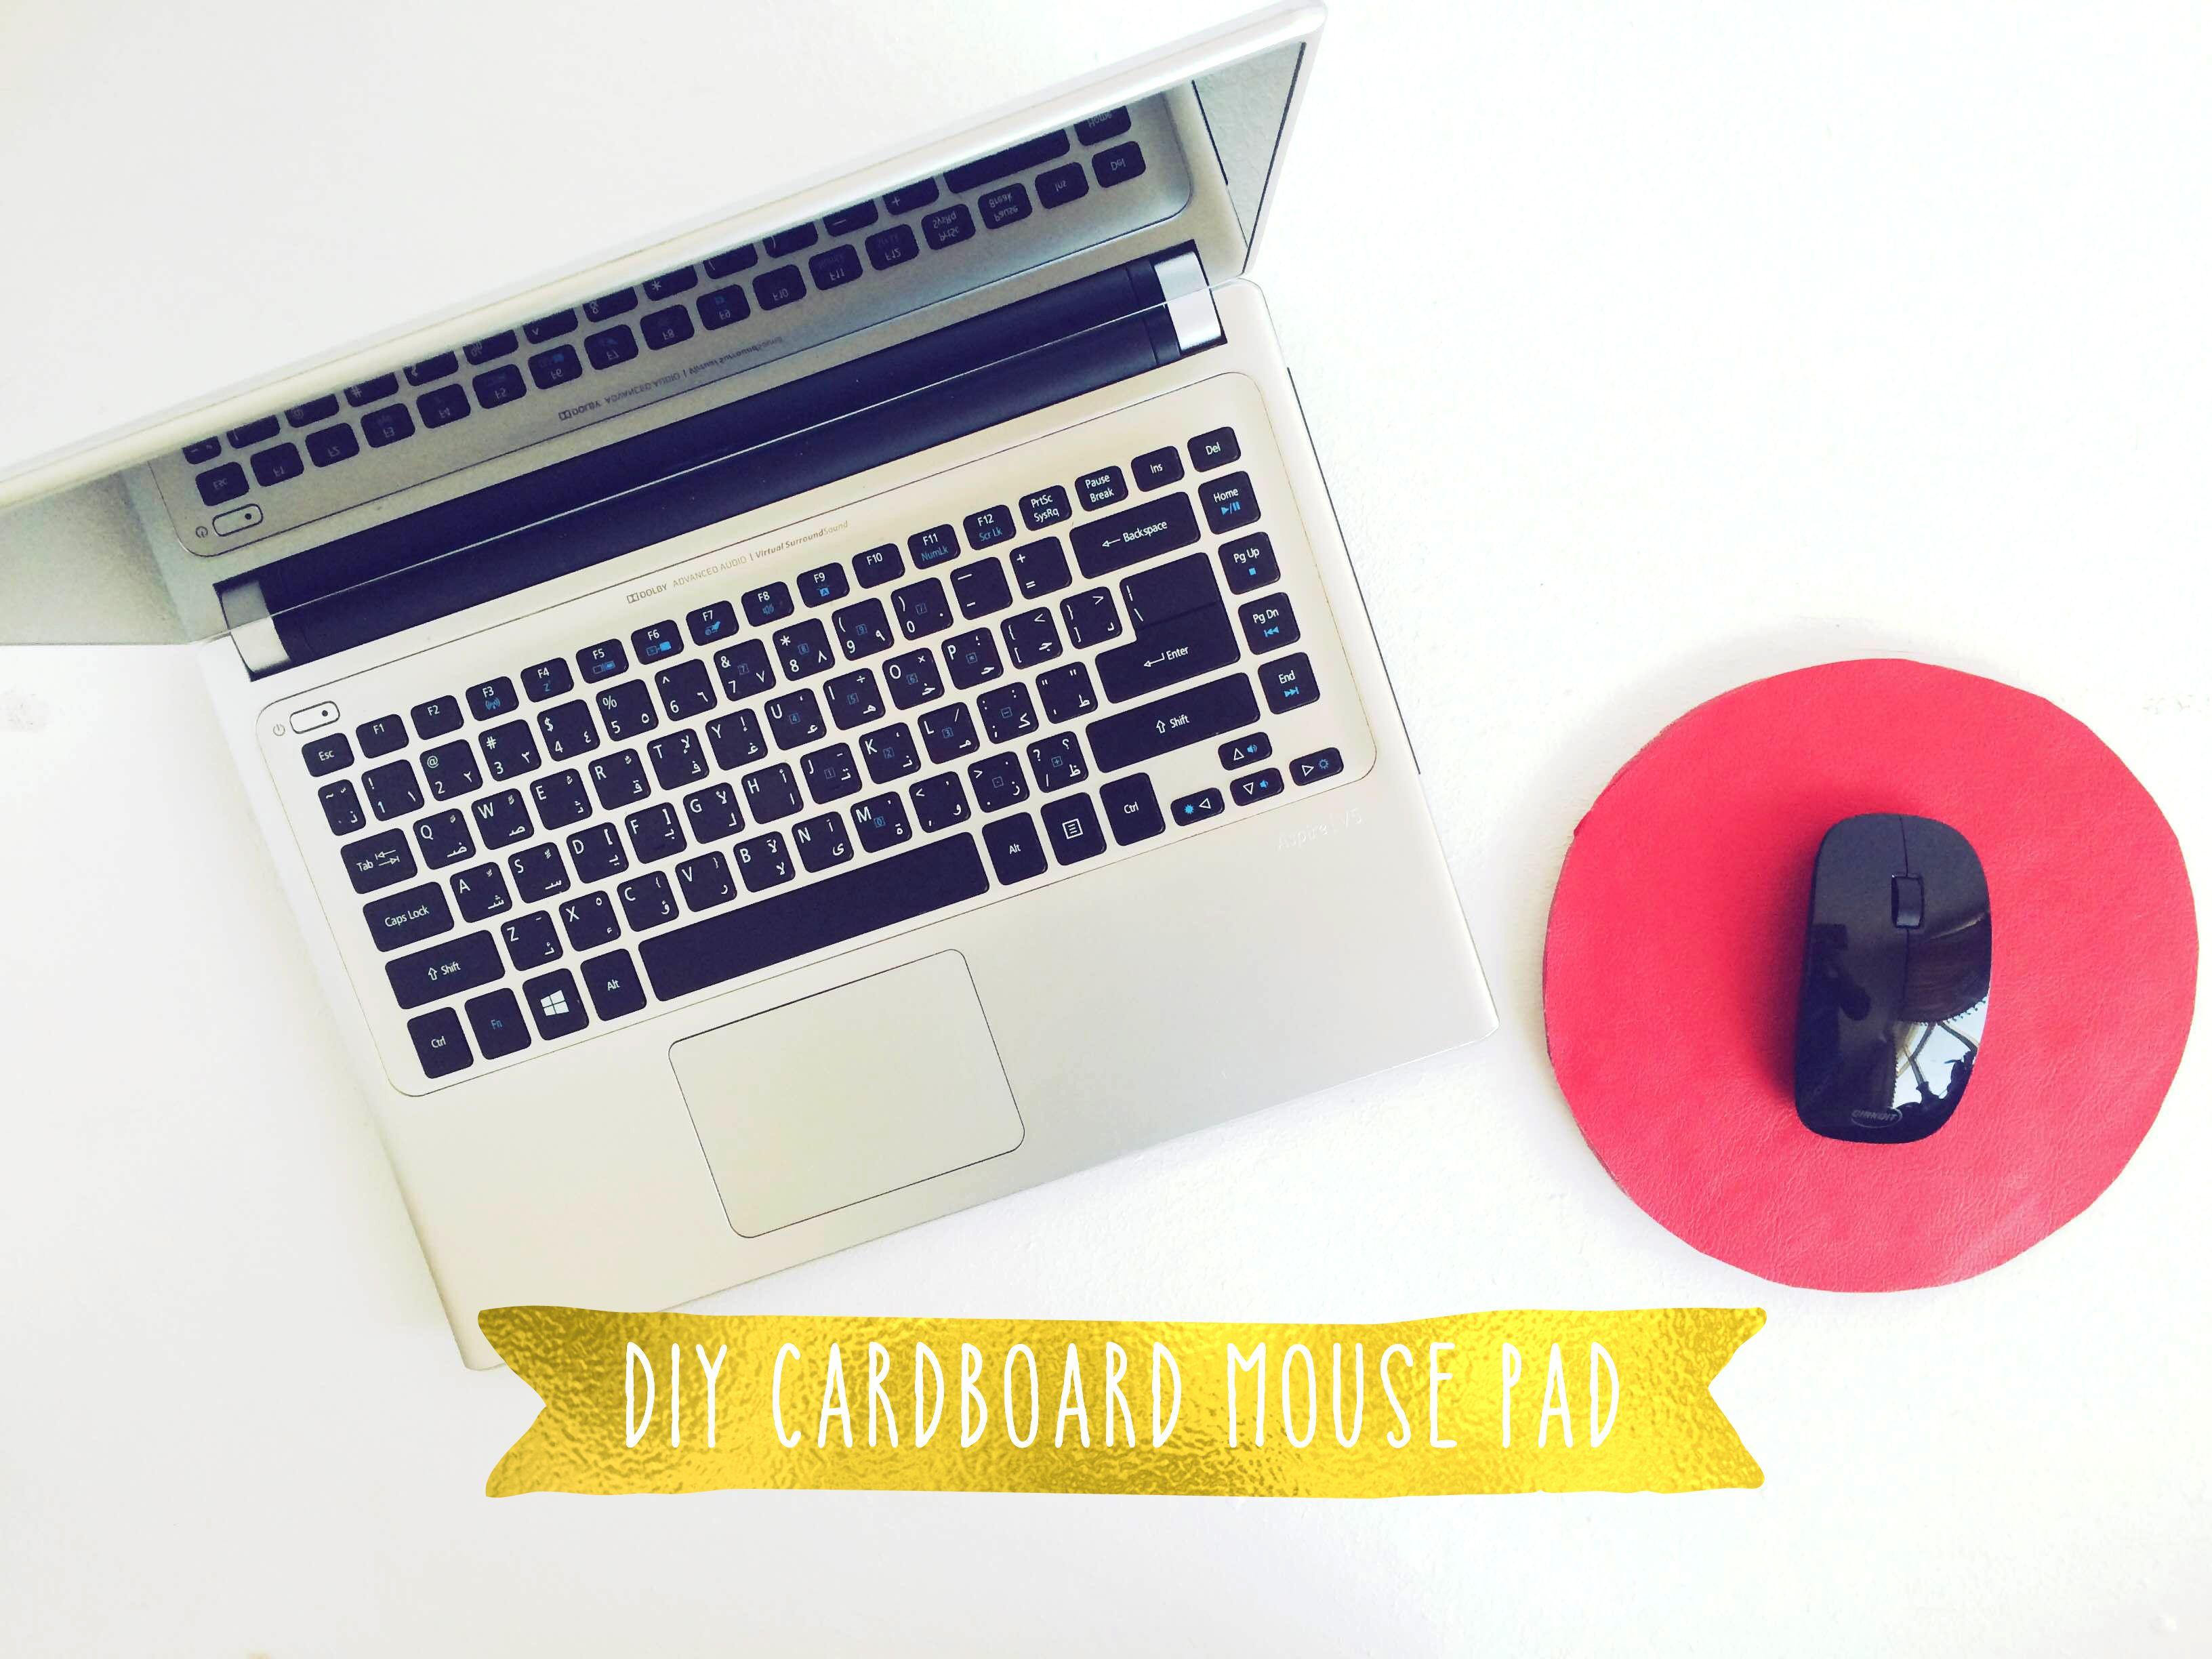 Diy Cardboard Mouse Pad Diy Mouse Pad Diy Cardboard Cardboard